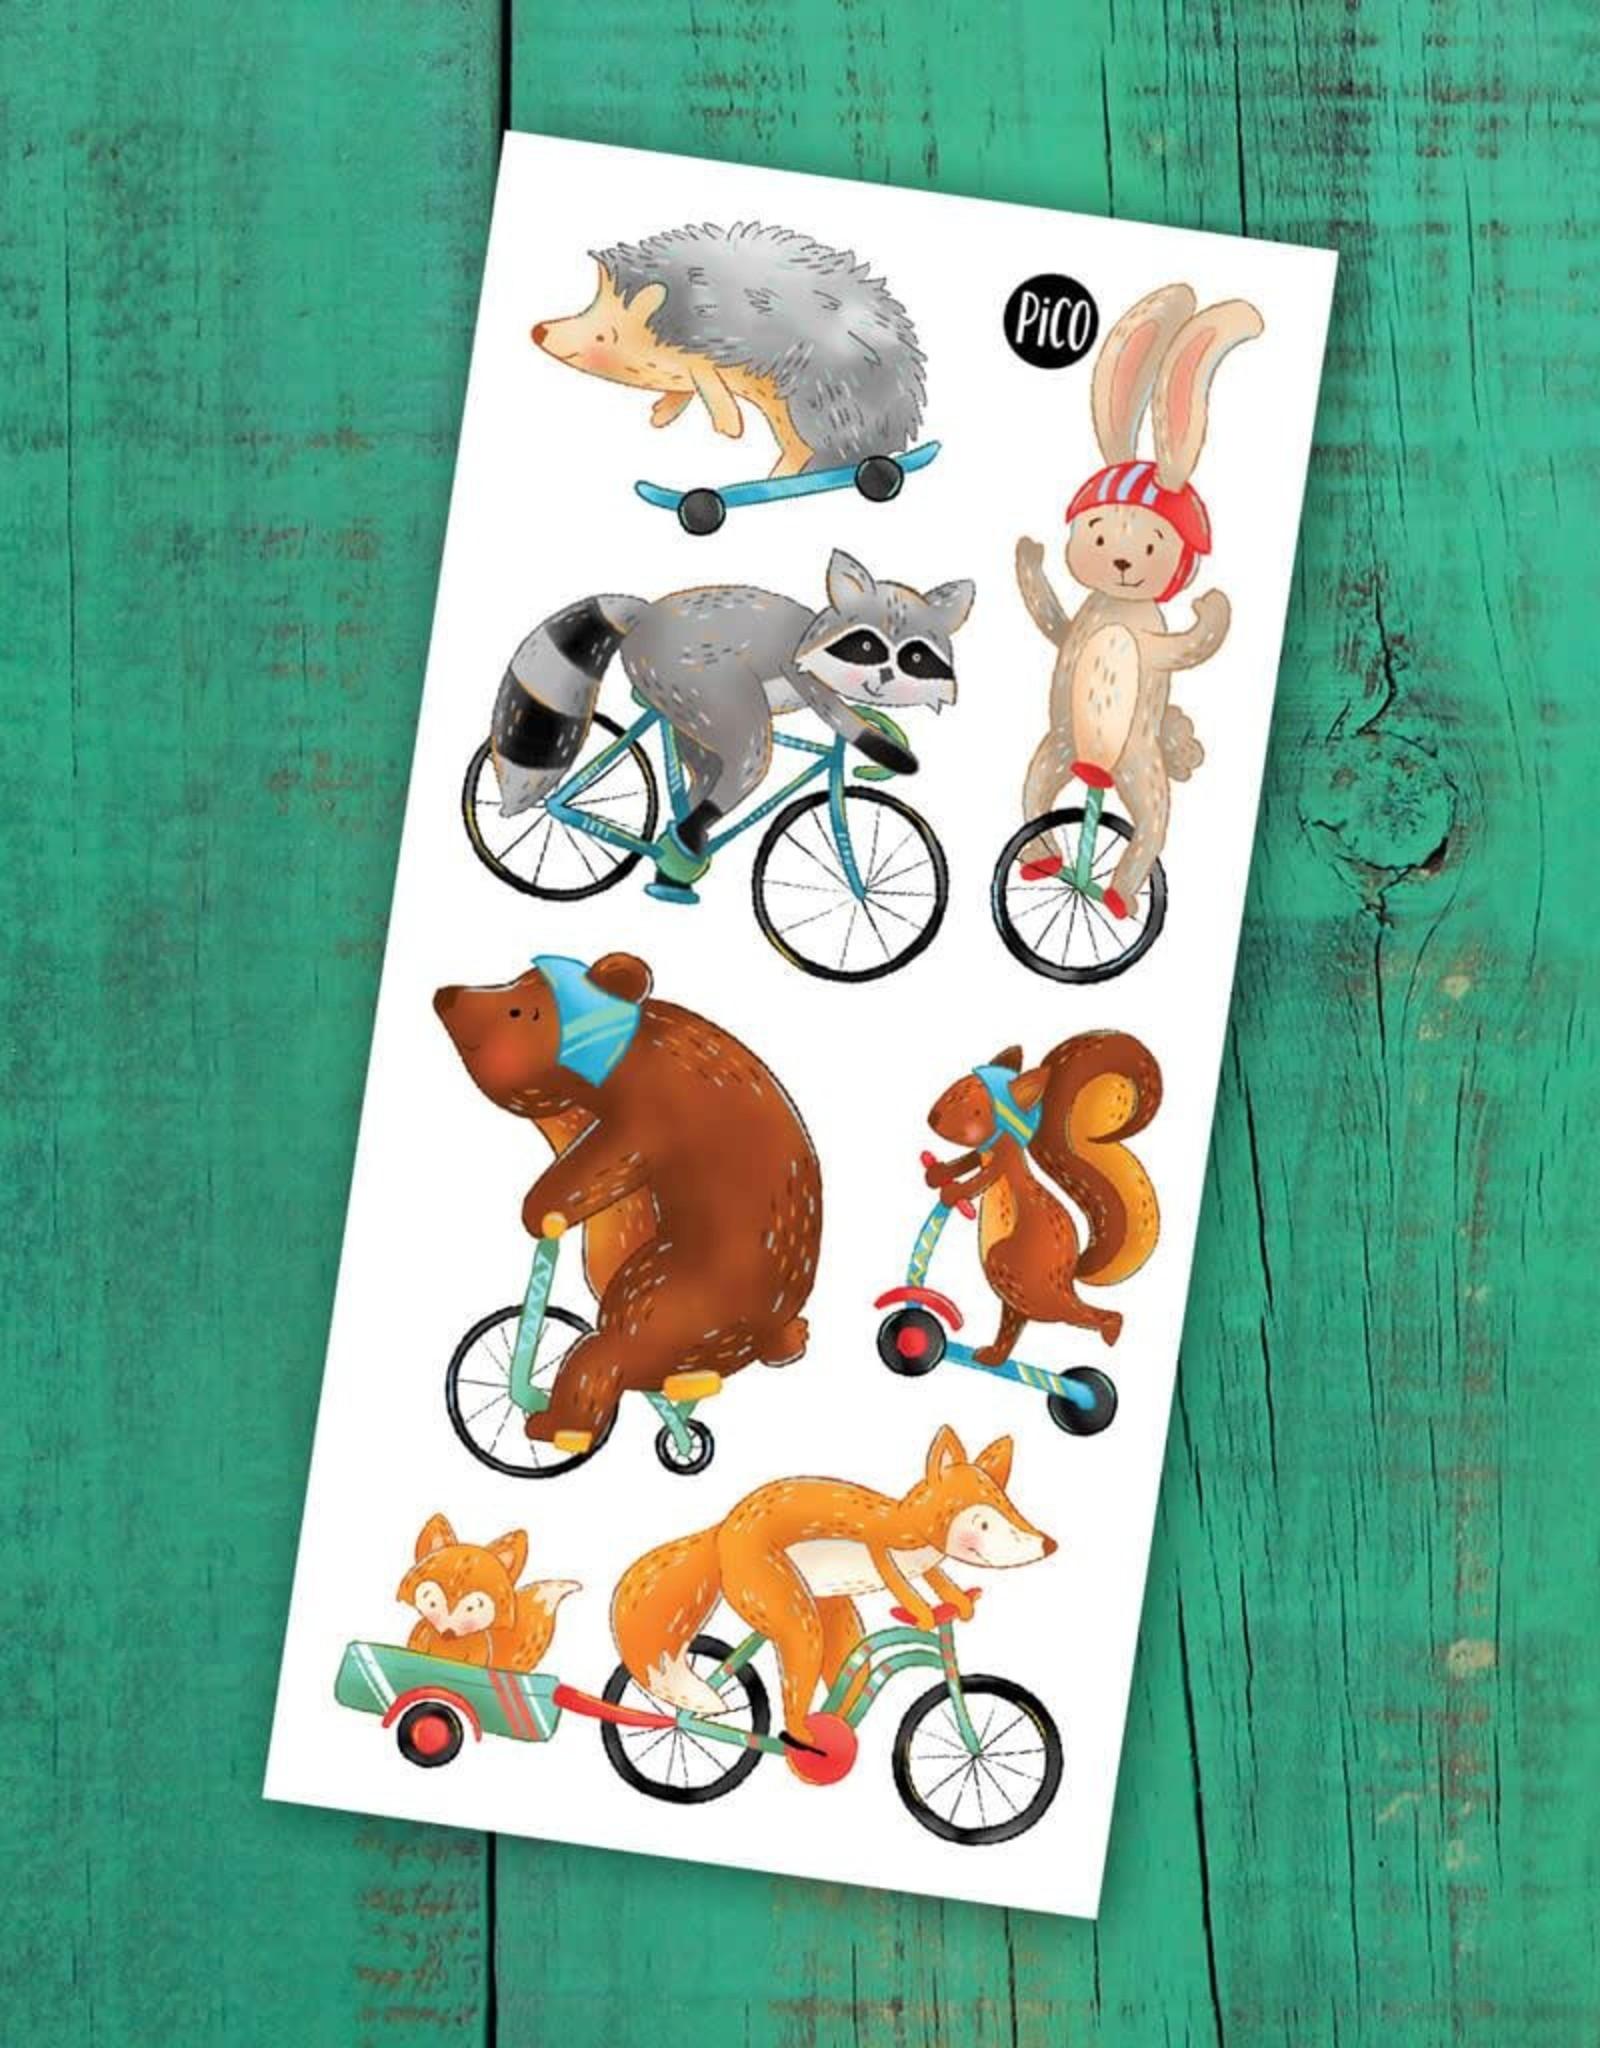 Pico Tattoo -  Bike Ride